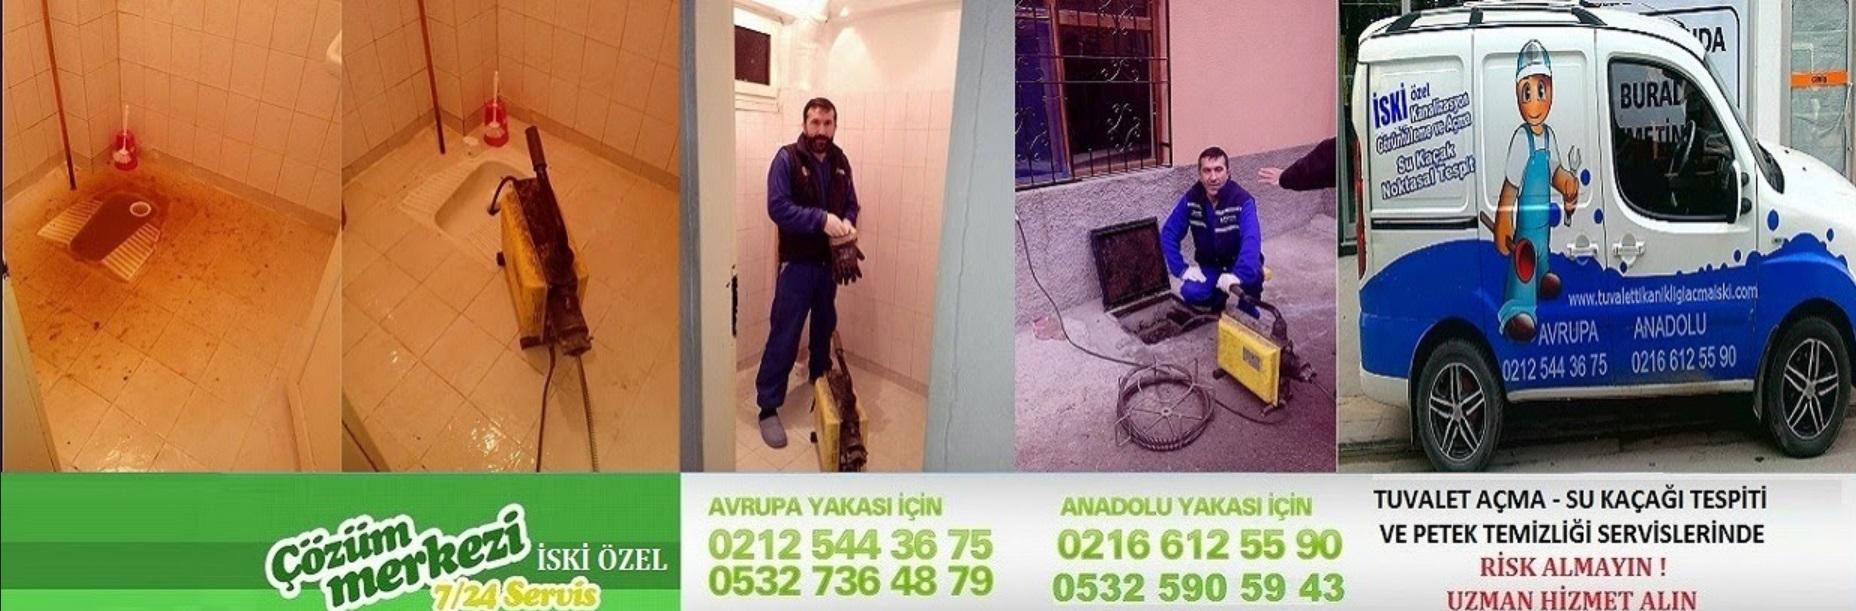 Tuvalet , Lavabo Açma 99 TL